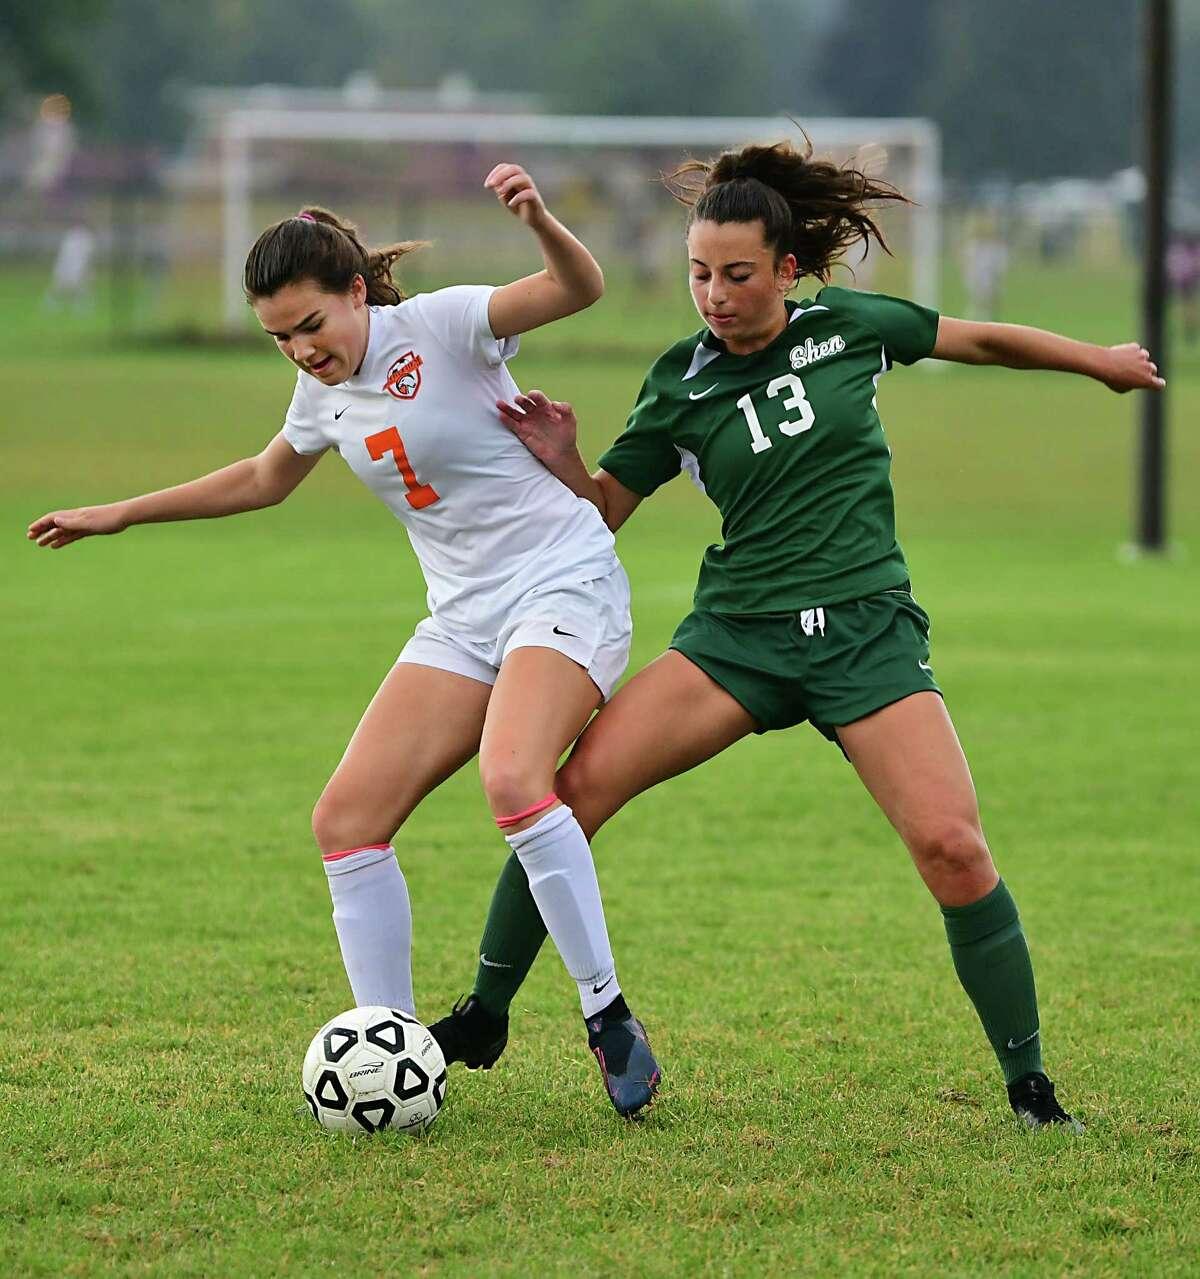 Shenendehowa's Sophia DeMura battles with Bethlehem's Katie Sellers in 2019. DeMura helped the Lady Plainsmen limit opponents to six goals for the season.